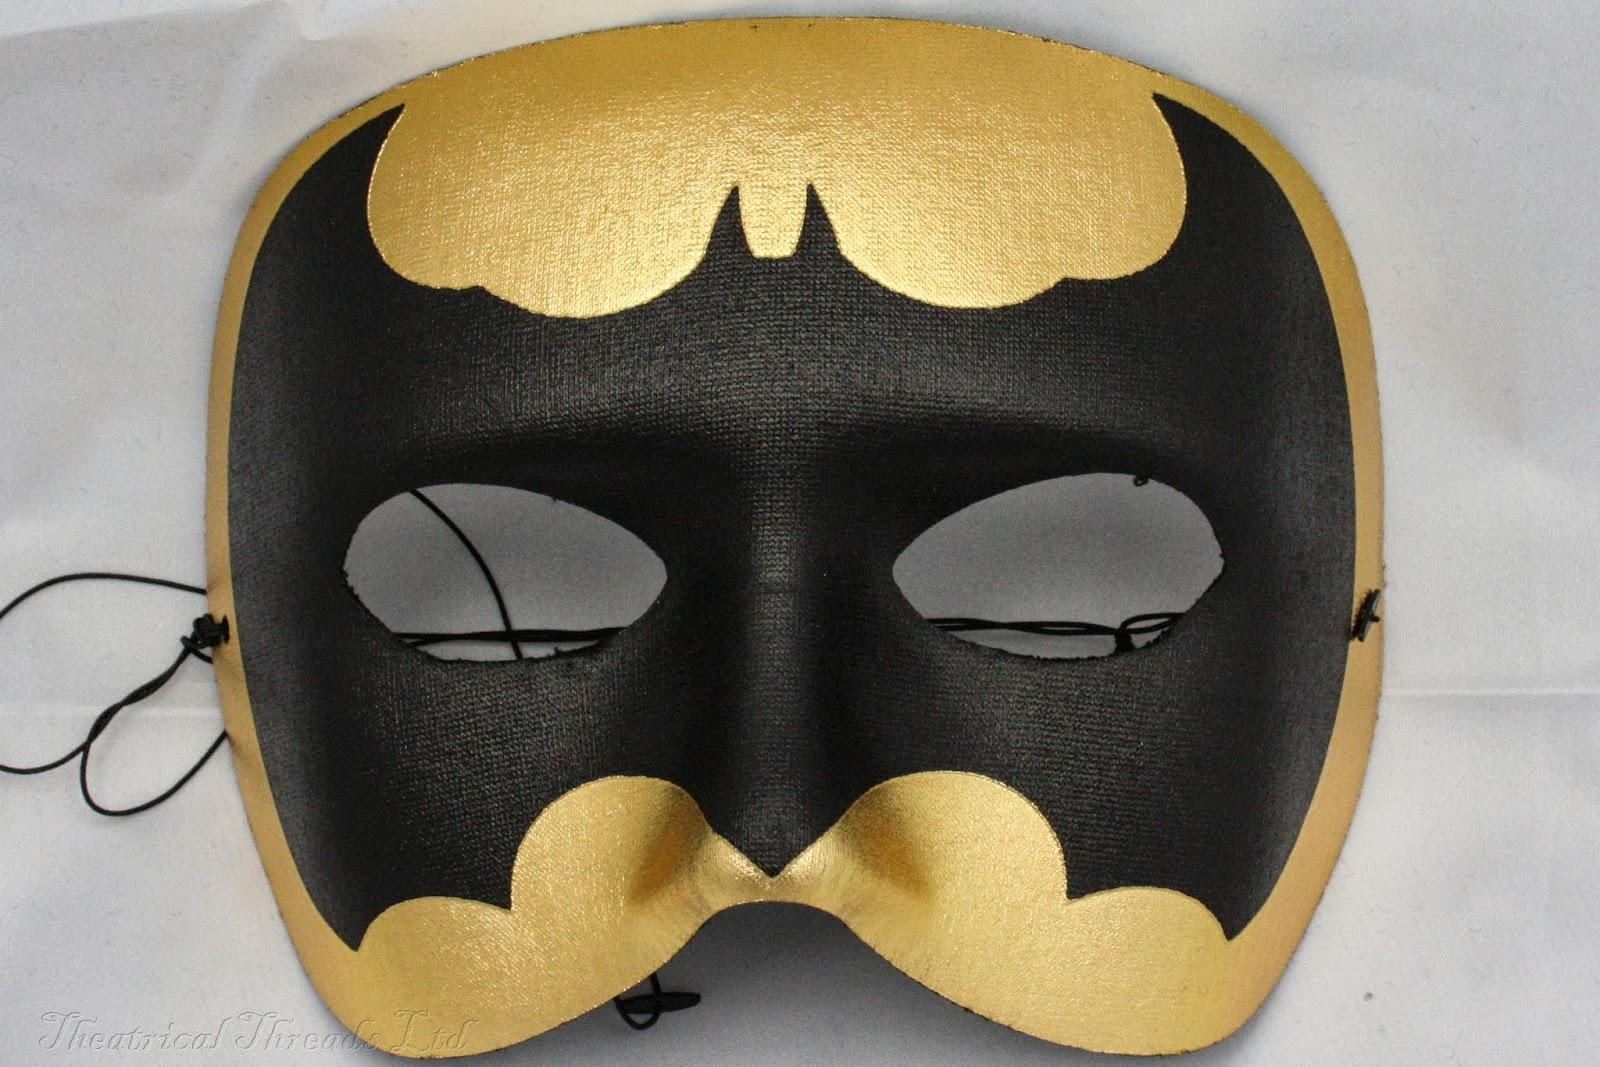 6e87f7197453 Bat Masquerade Ball Mask from Theatrical Threads Ltd